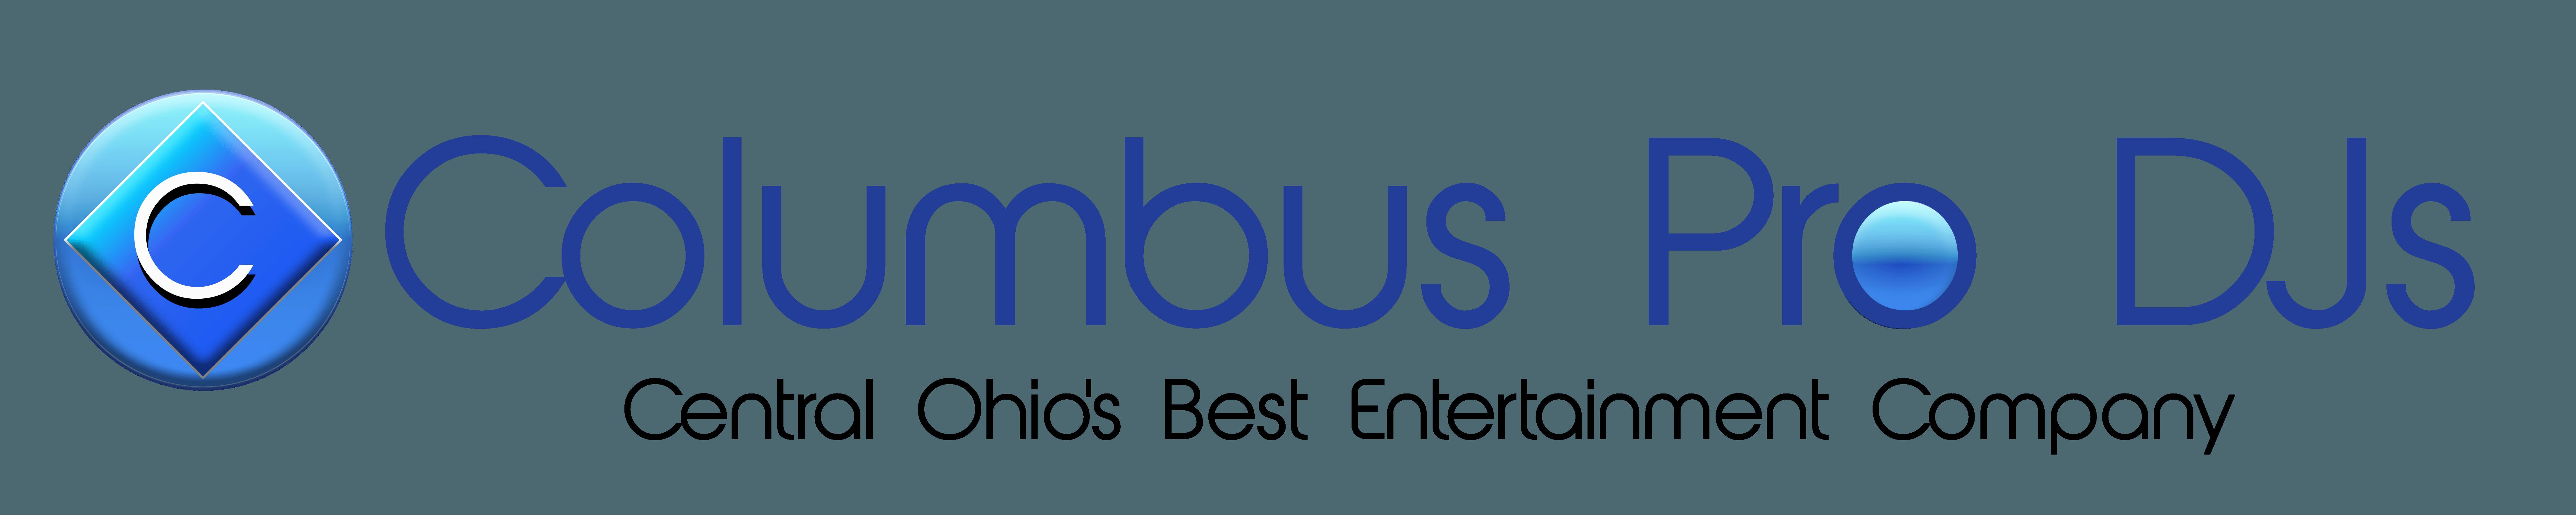 Columbus Pro DJs